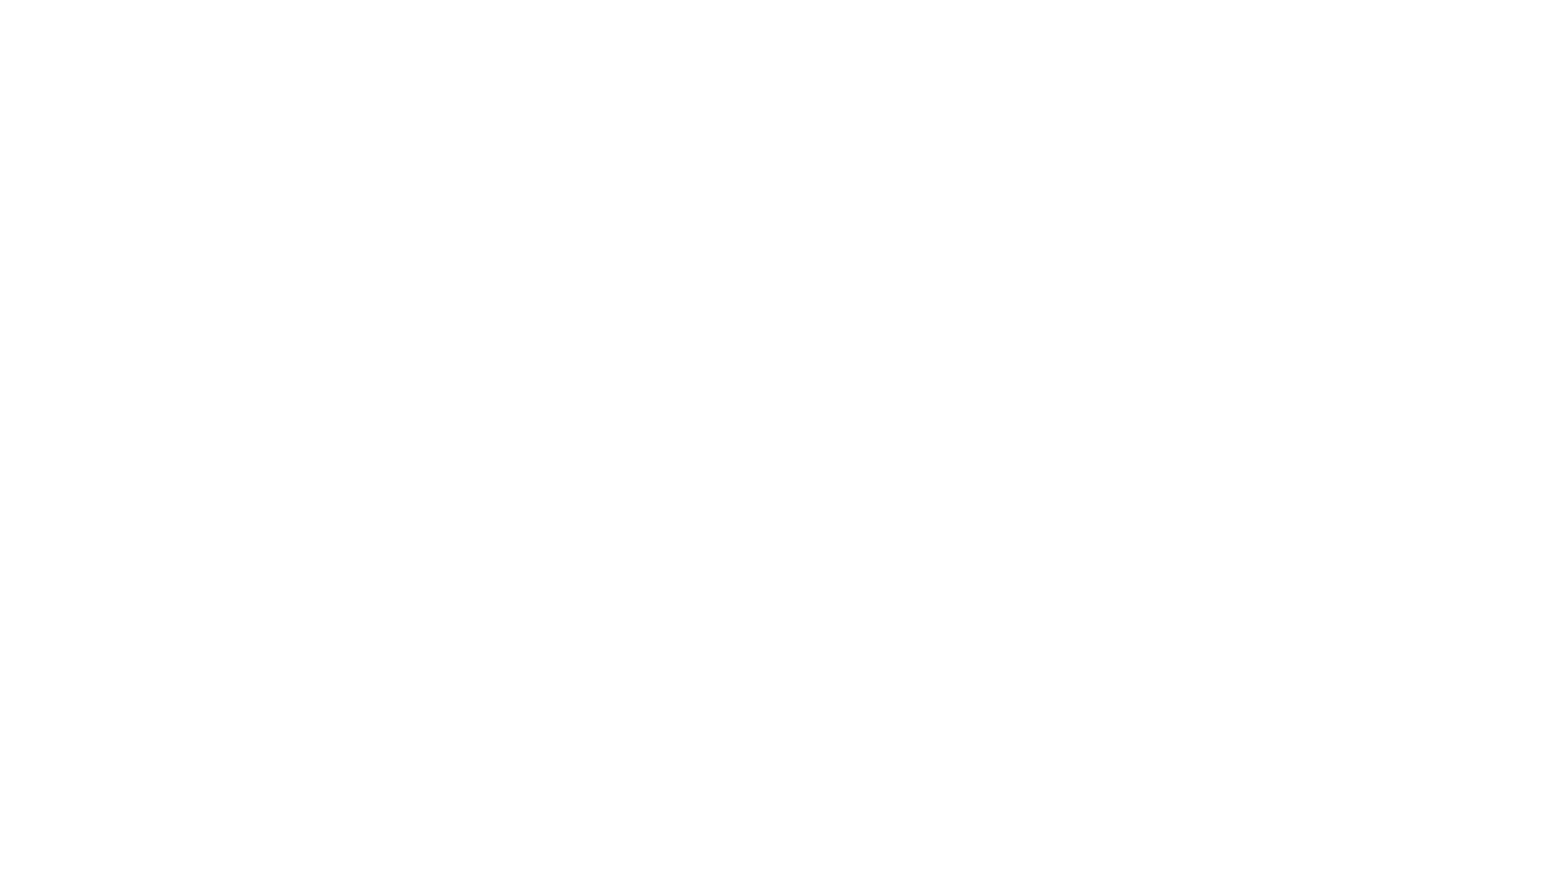 Game Development Program - Learn How to Make Games